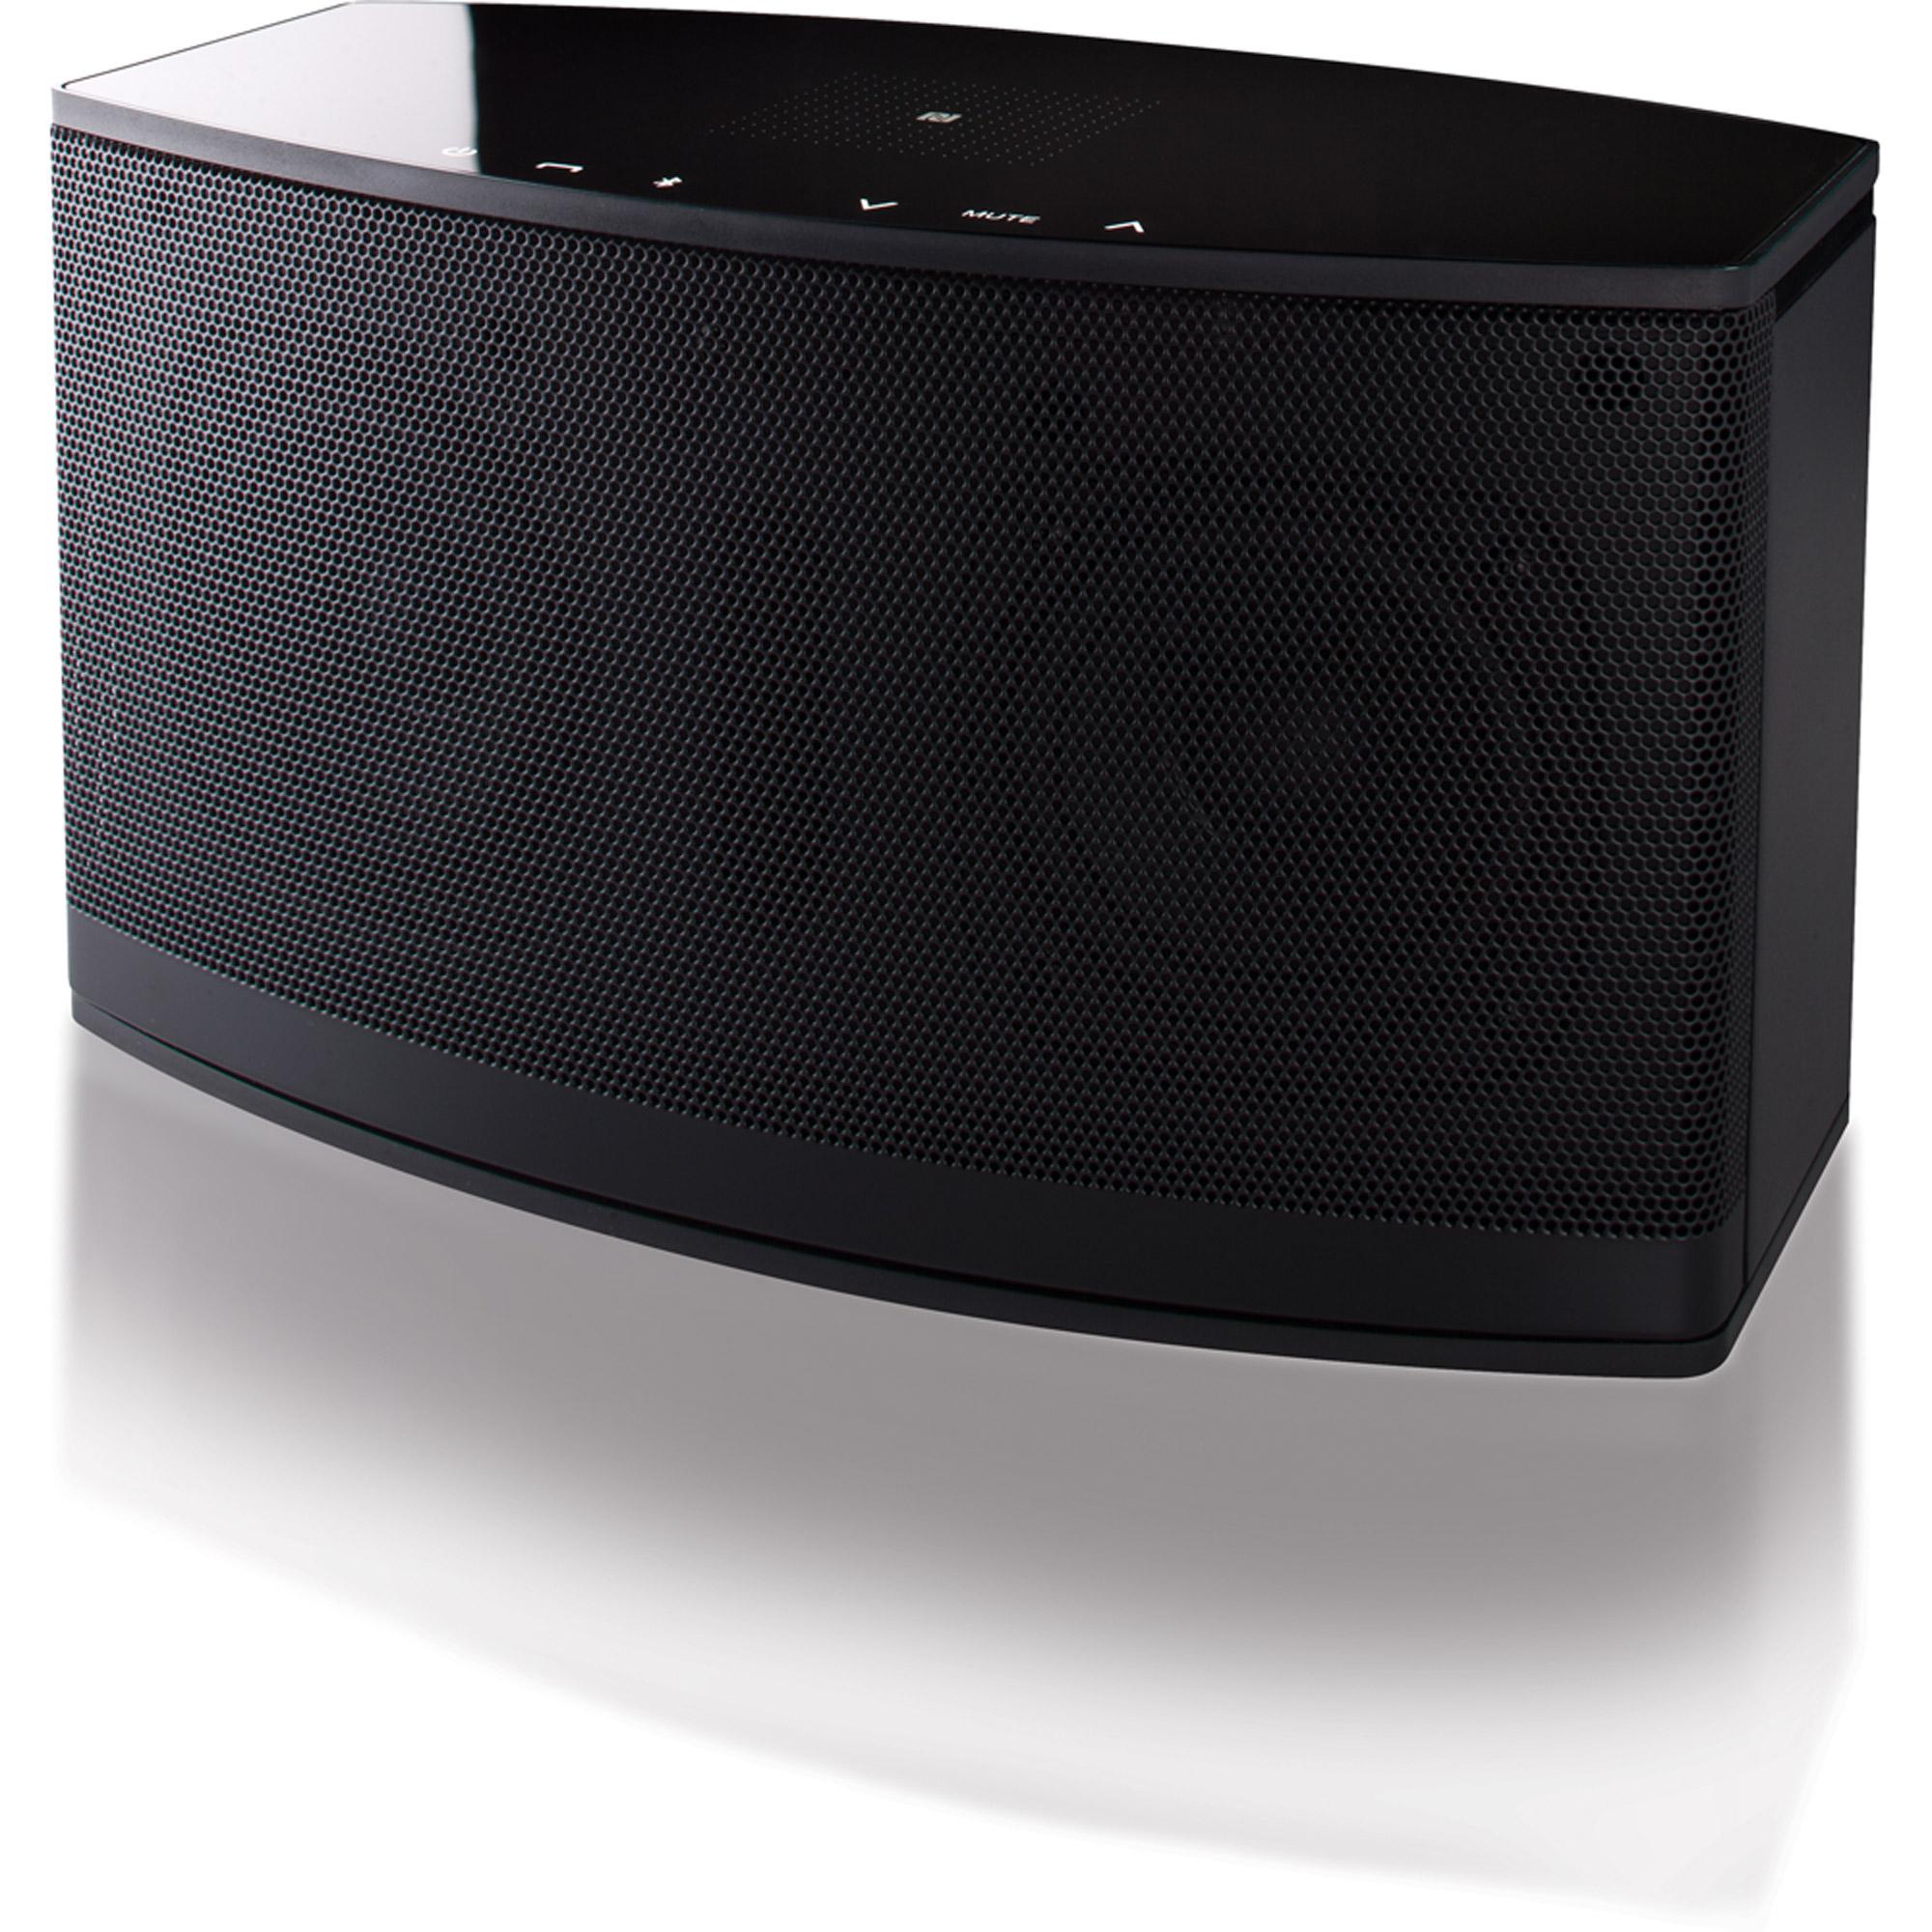 bluetooth speakers walmart. blackweb tsunami bluetooth speaker speakers walmart t